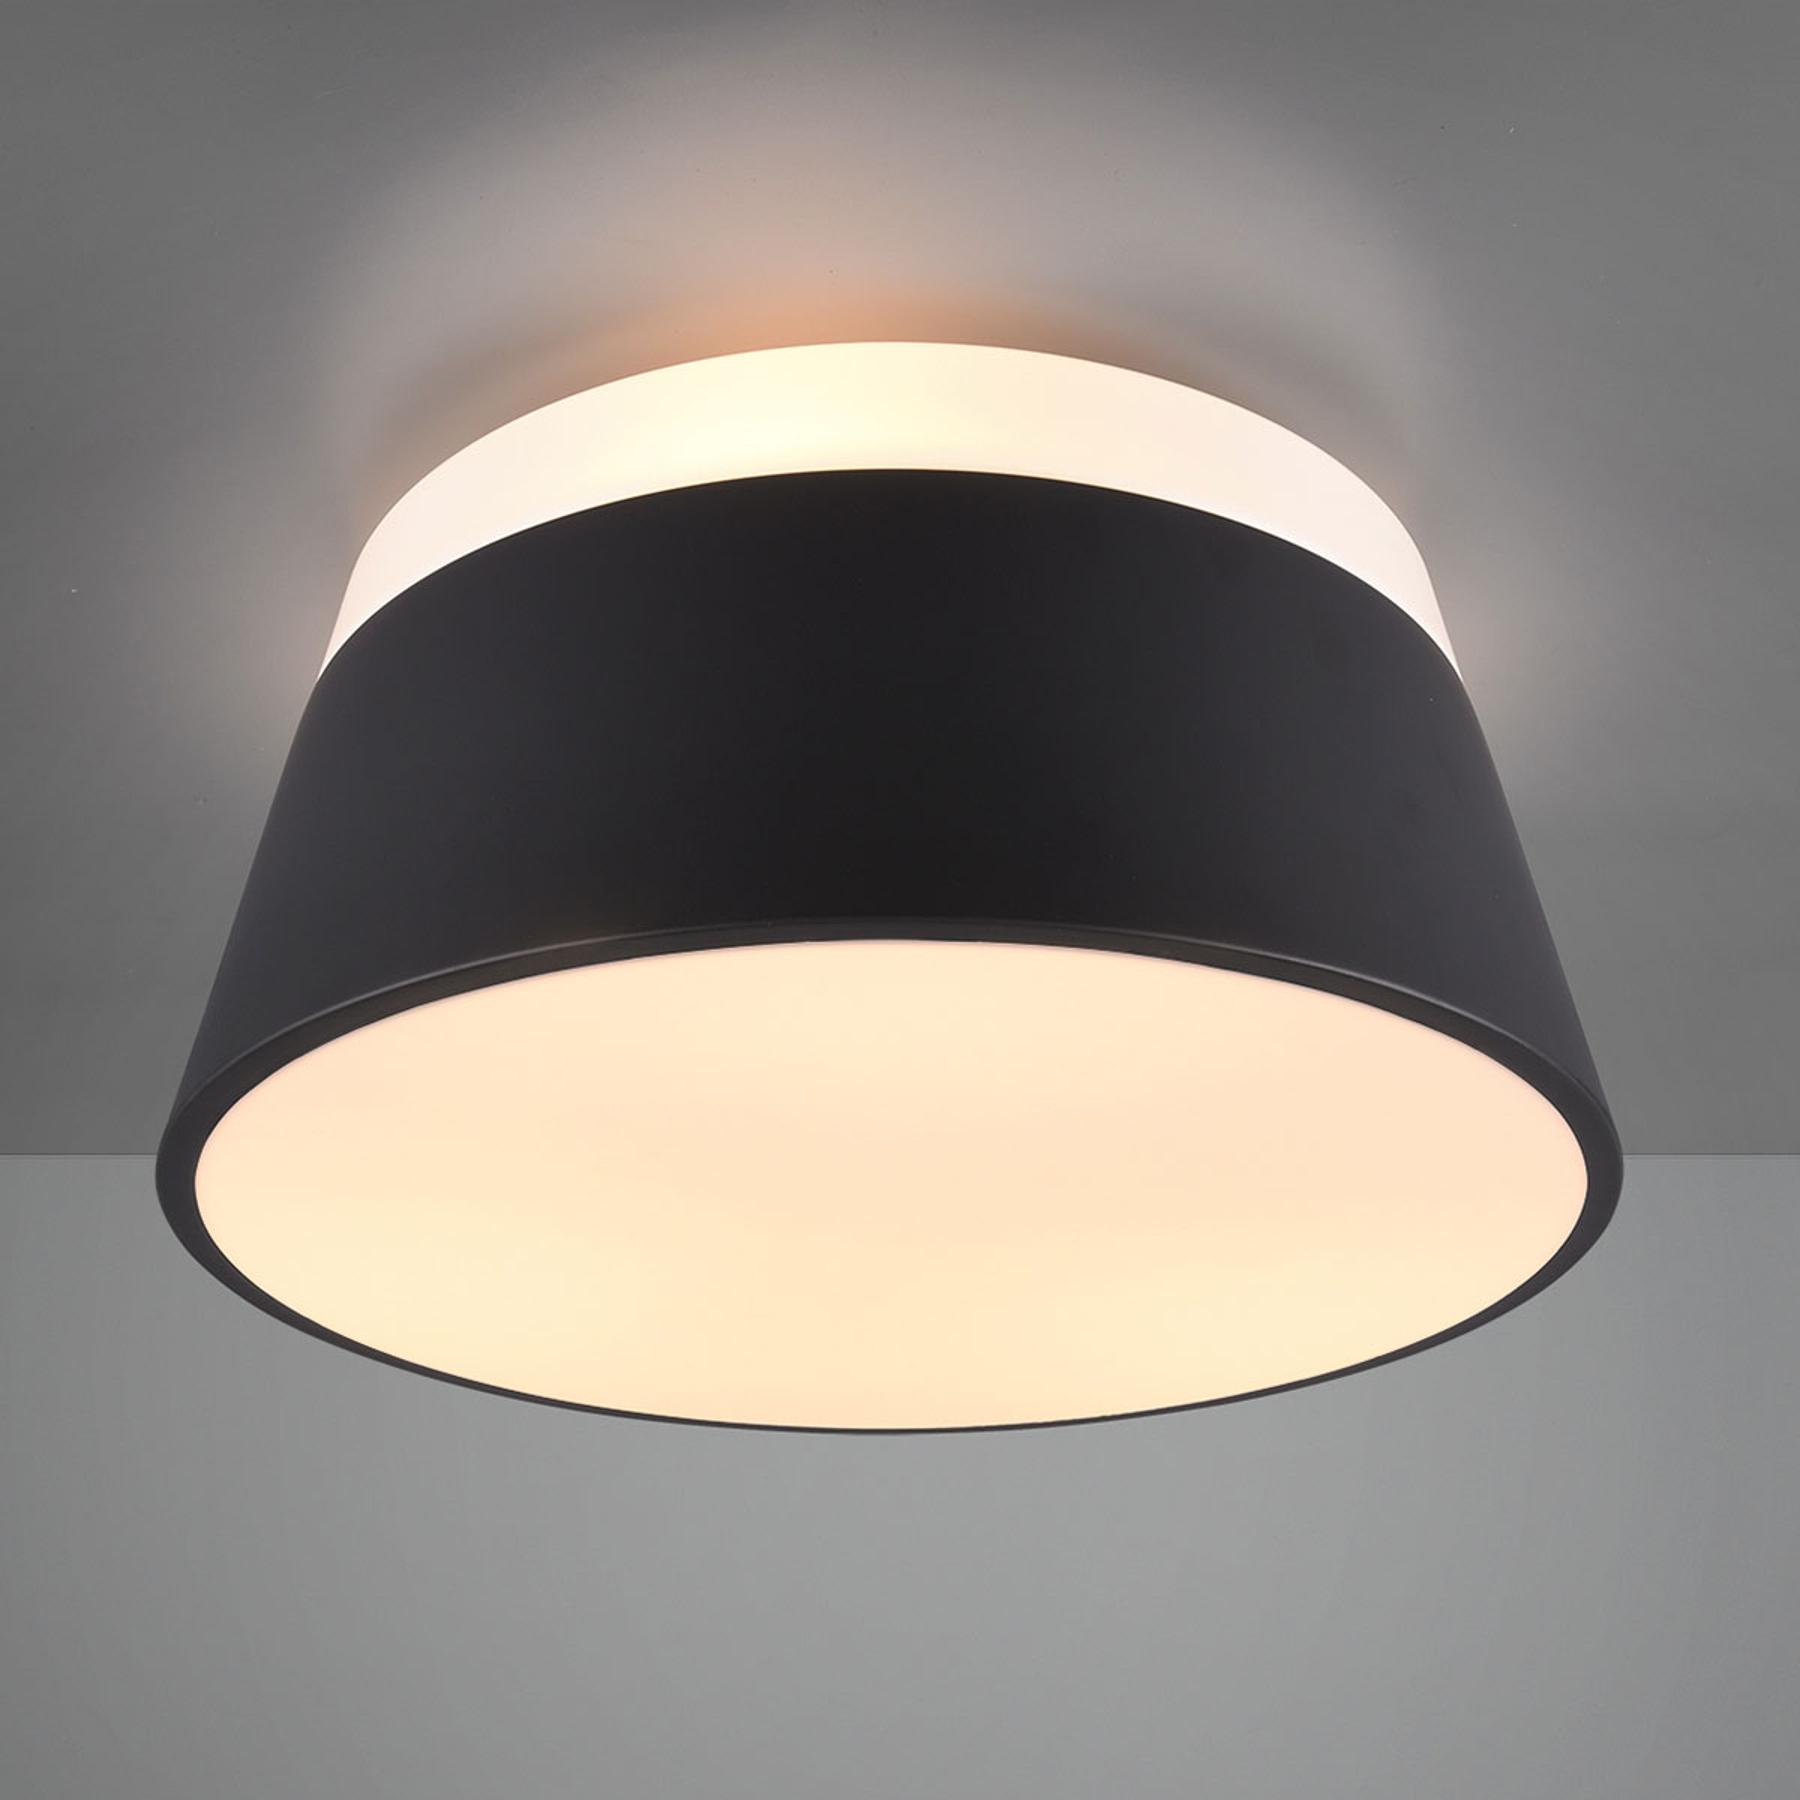 Lampa sufitowa Baroness antracyt